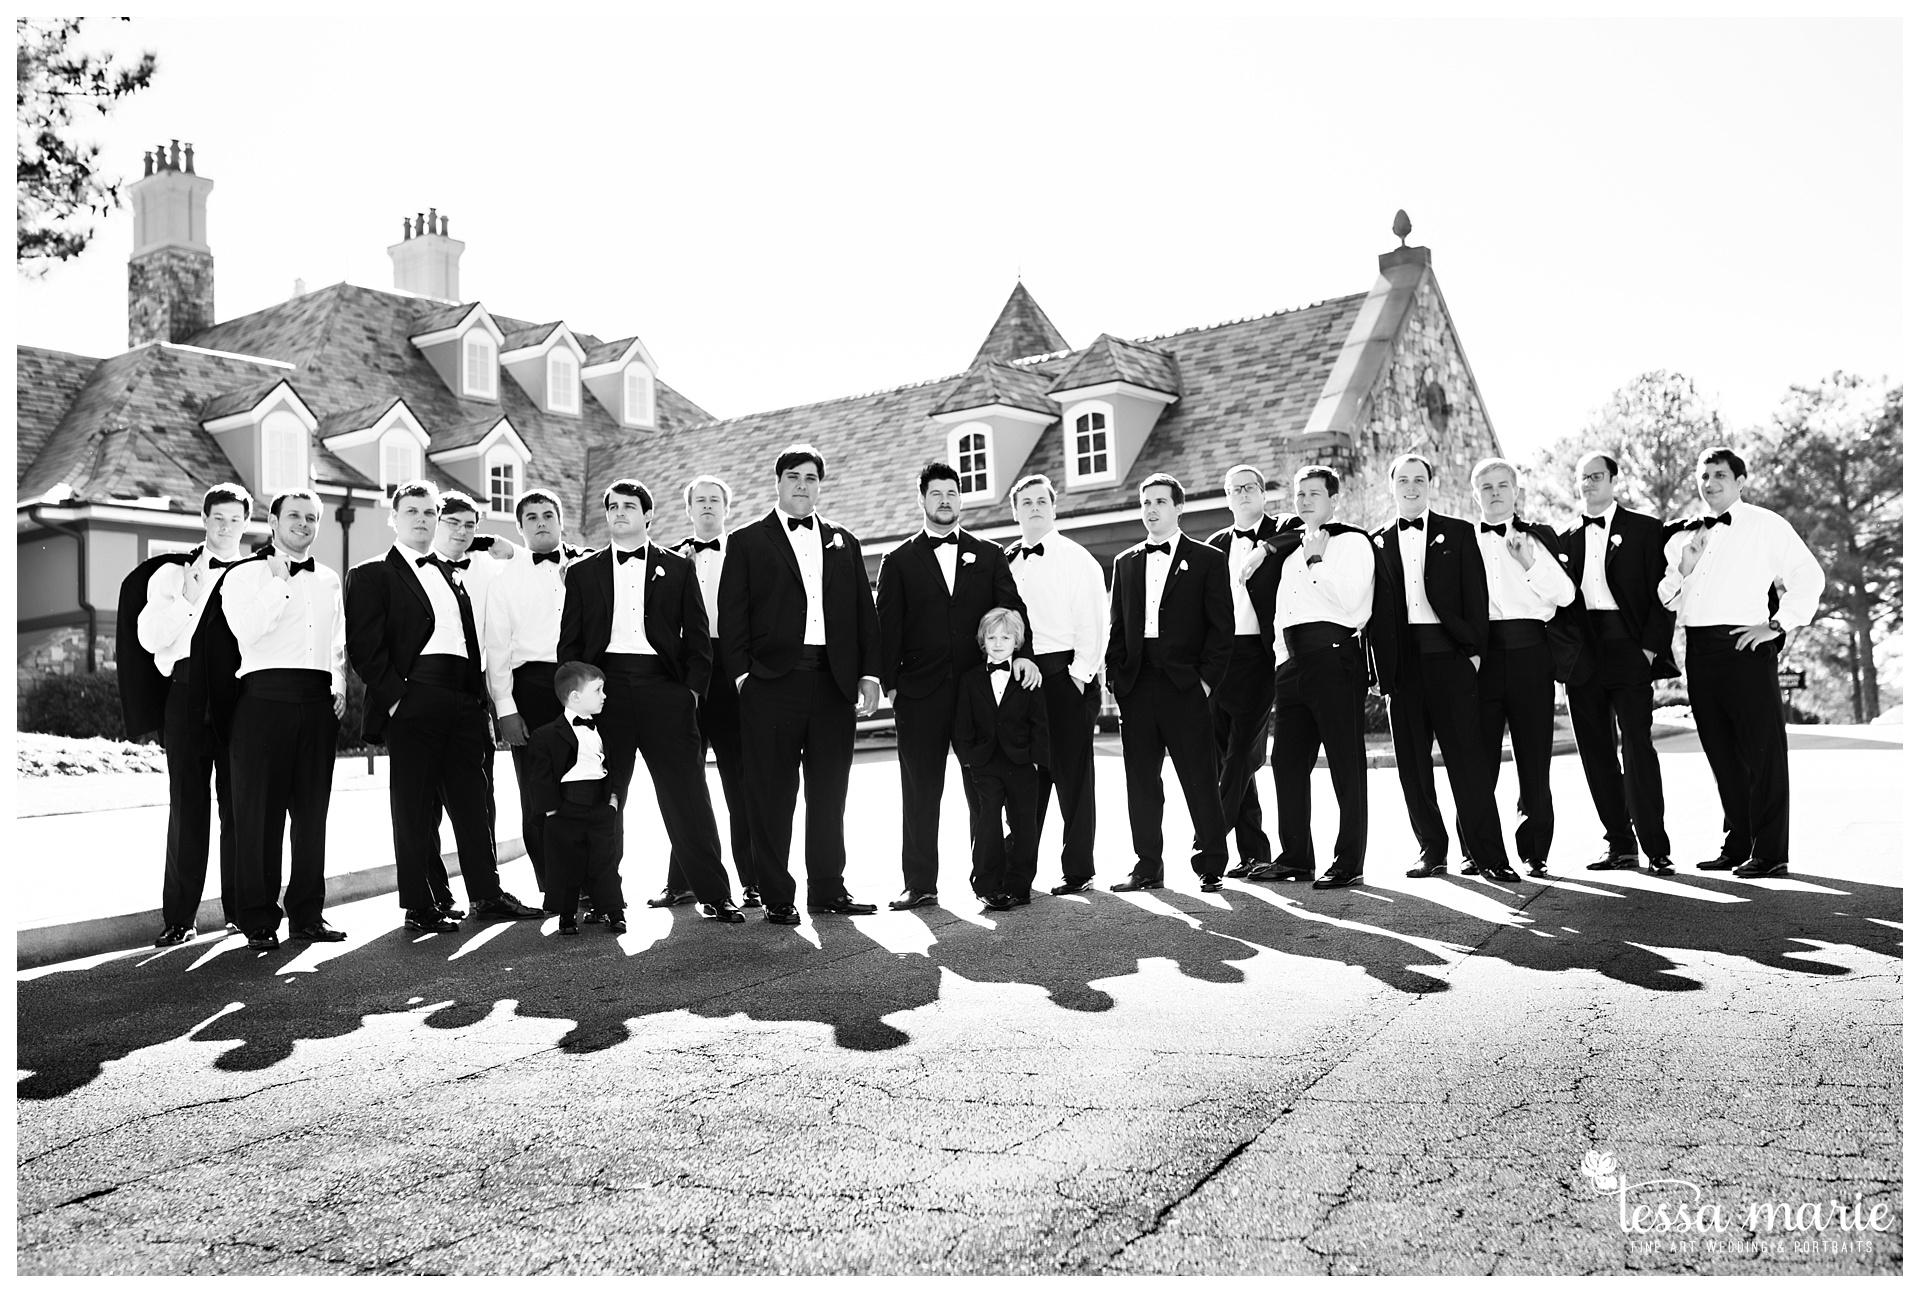 tessa_marie_weddings_legacy_story_focused_wedding_pictures_atlanta_wedding_photographer_0101